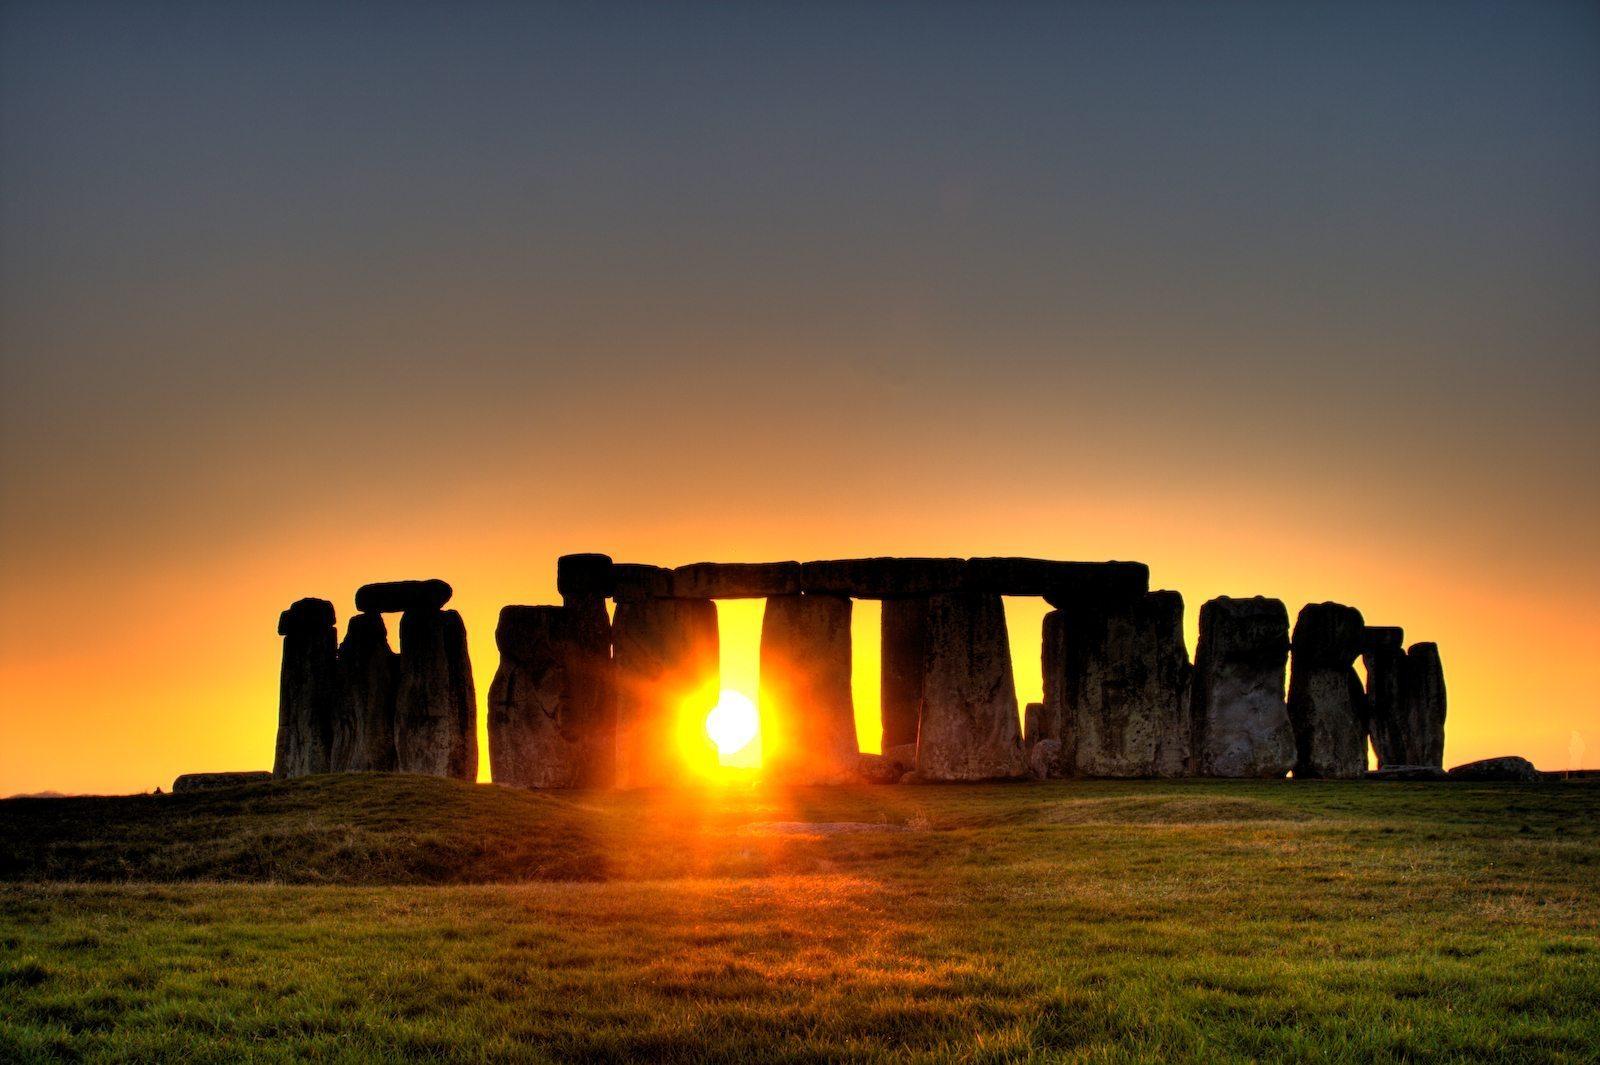 Image: Stonehenge with the sun setting through it